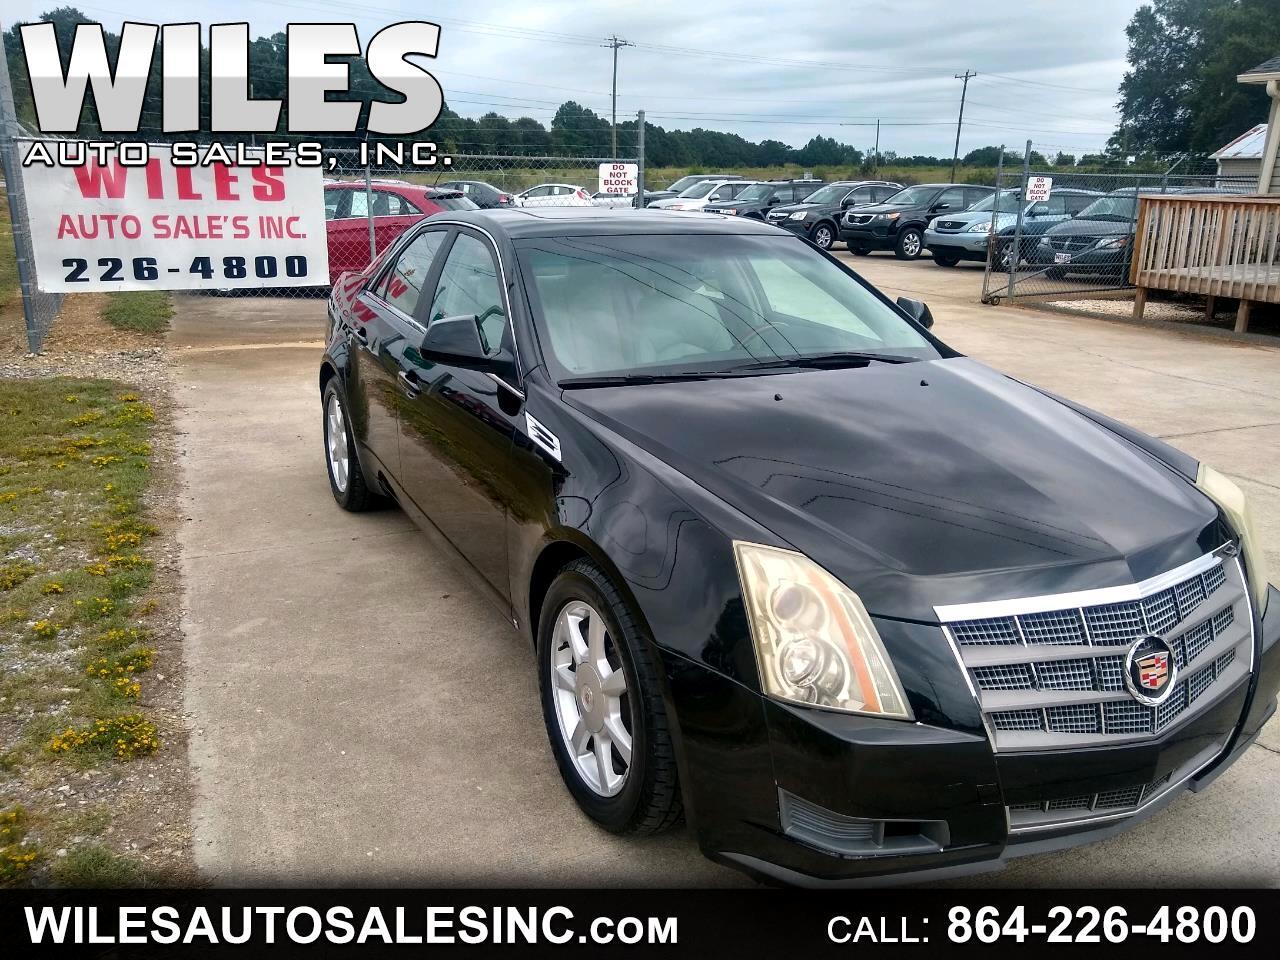 2008 Cadillac CTS 3.6L SFI